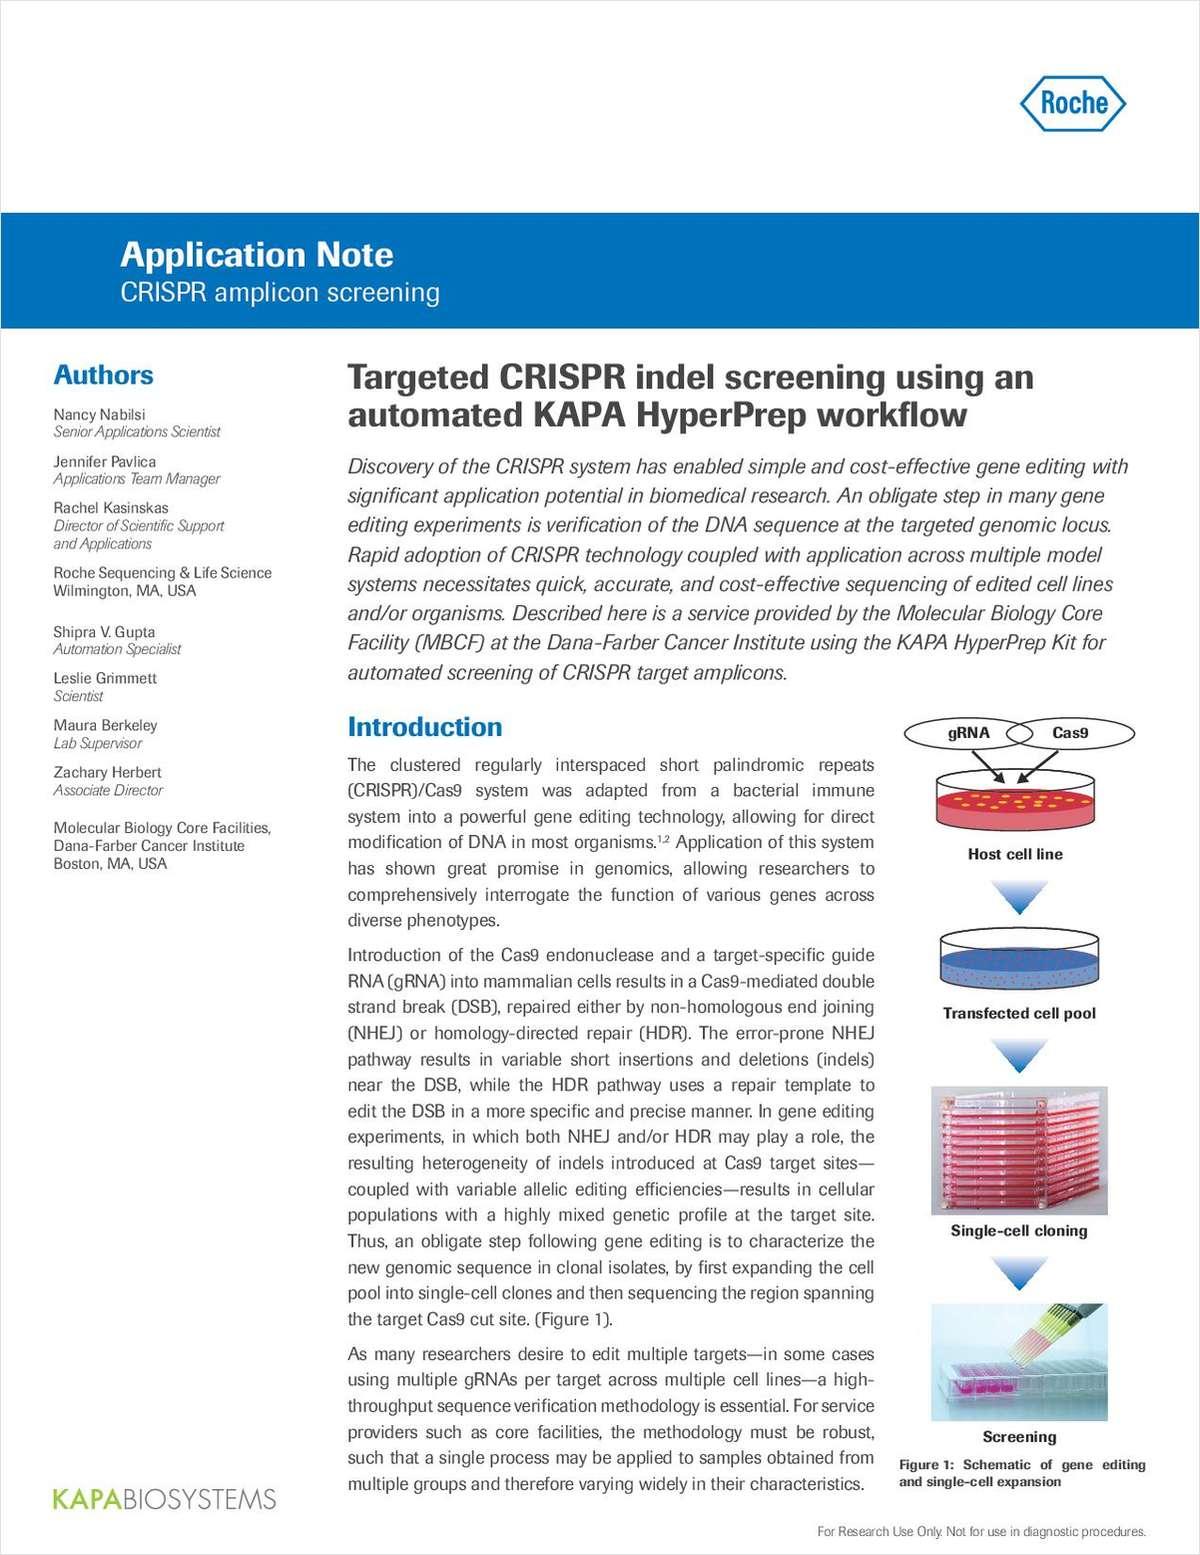 Targeted CRISPR Indel Screening Using an Automated KAPA HyperPrep Workflow